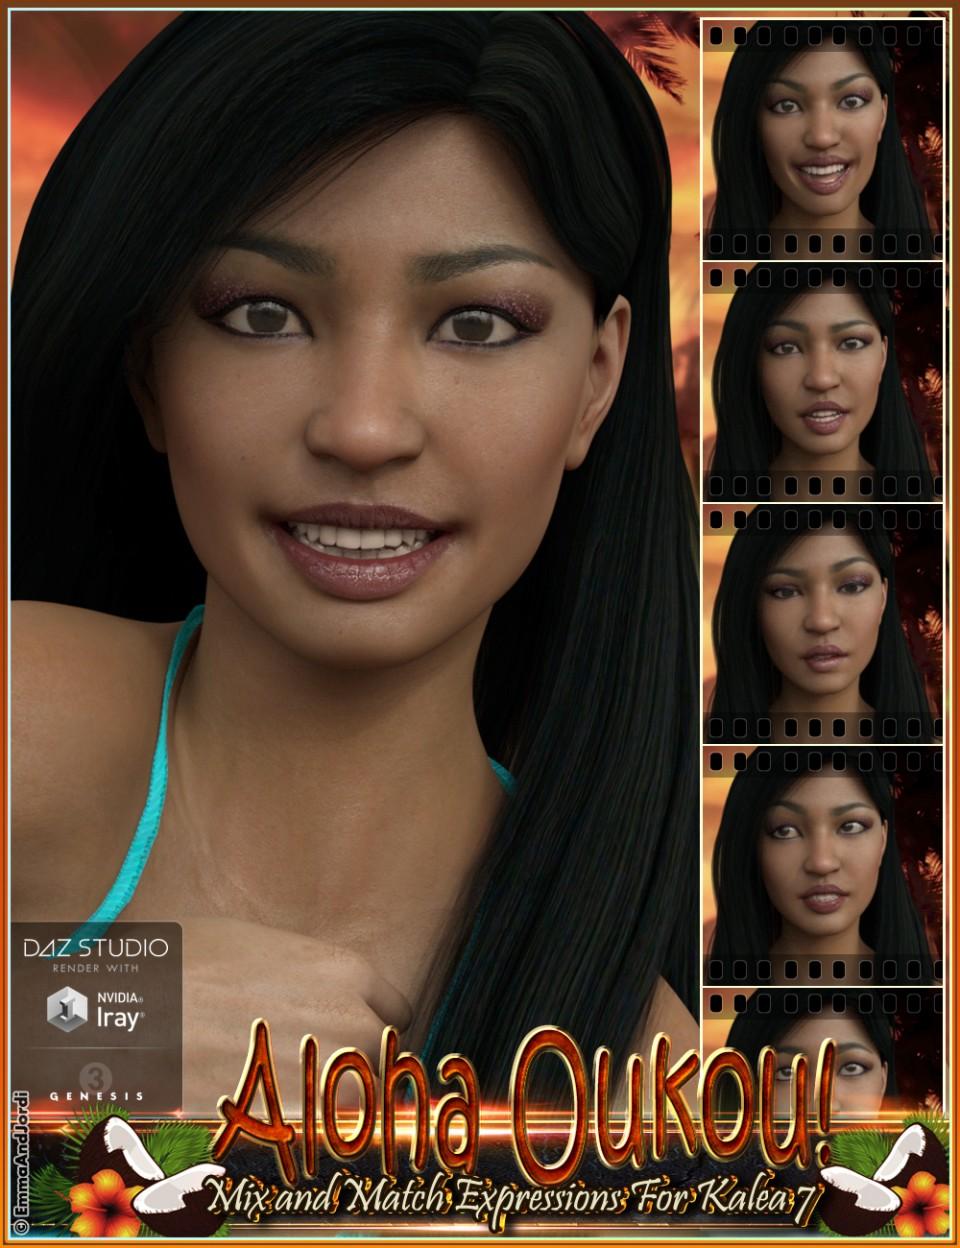 Aloha Oukou Mix and Match Expressions for Kalea 7 and Genesis 3 Female(s)